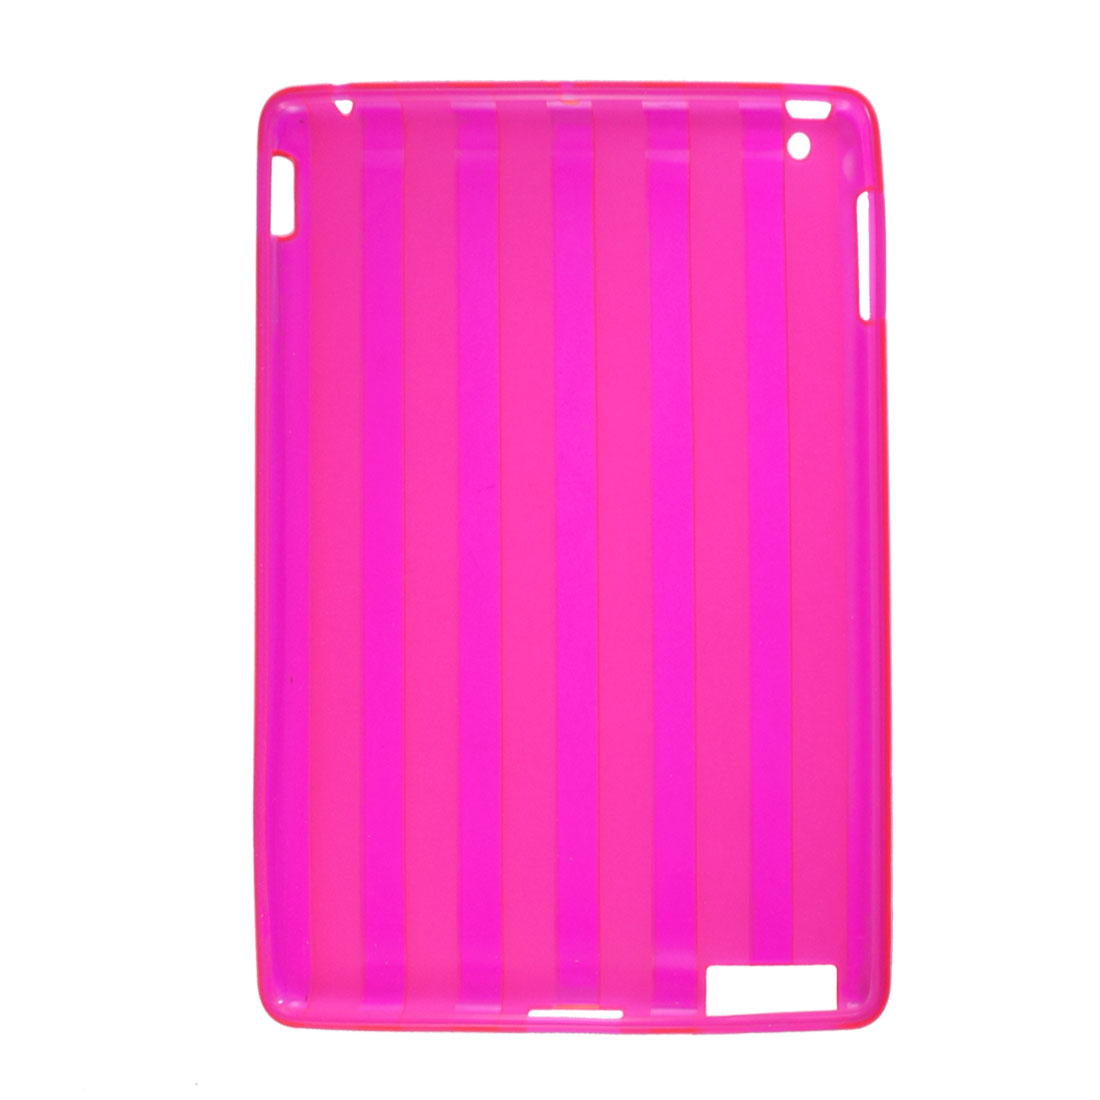 Unique Bargains Unique Bargains Fuchsia Amaranth Soft Plastic Vertical Stripe Cover for iPad 2G 3G